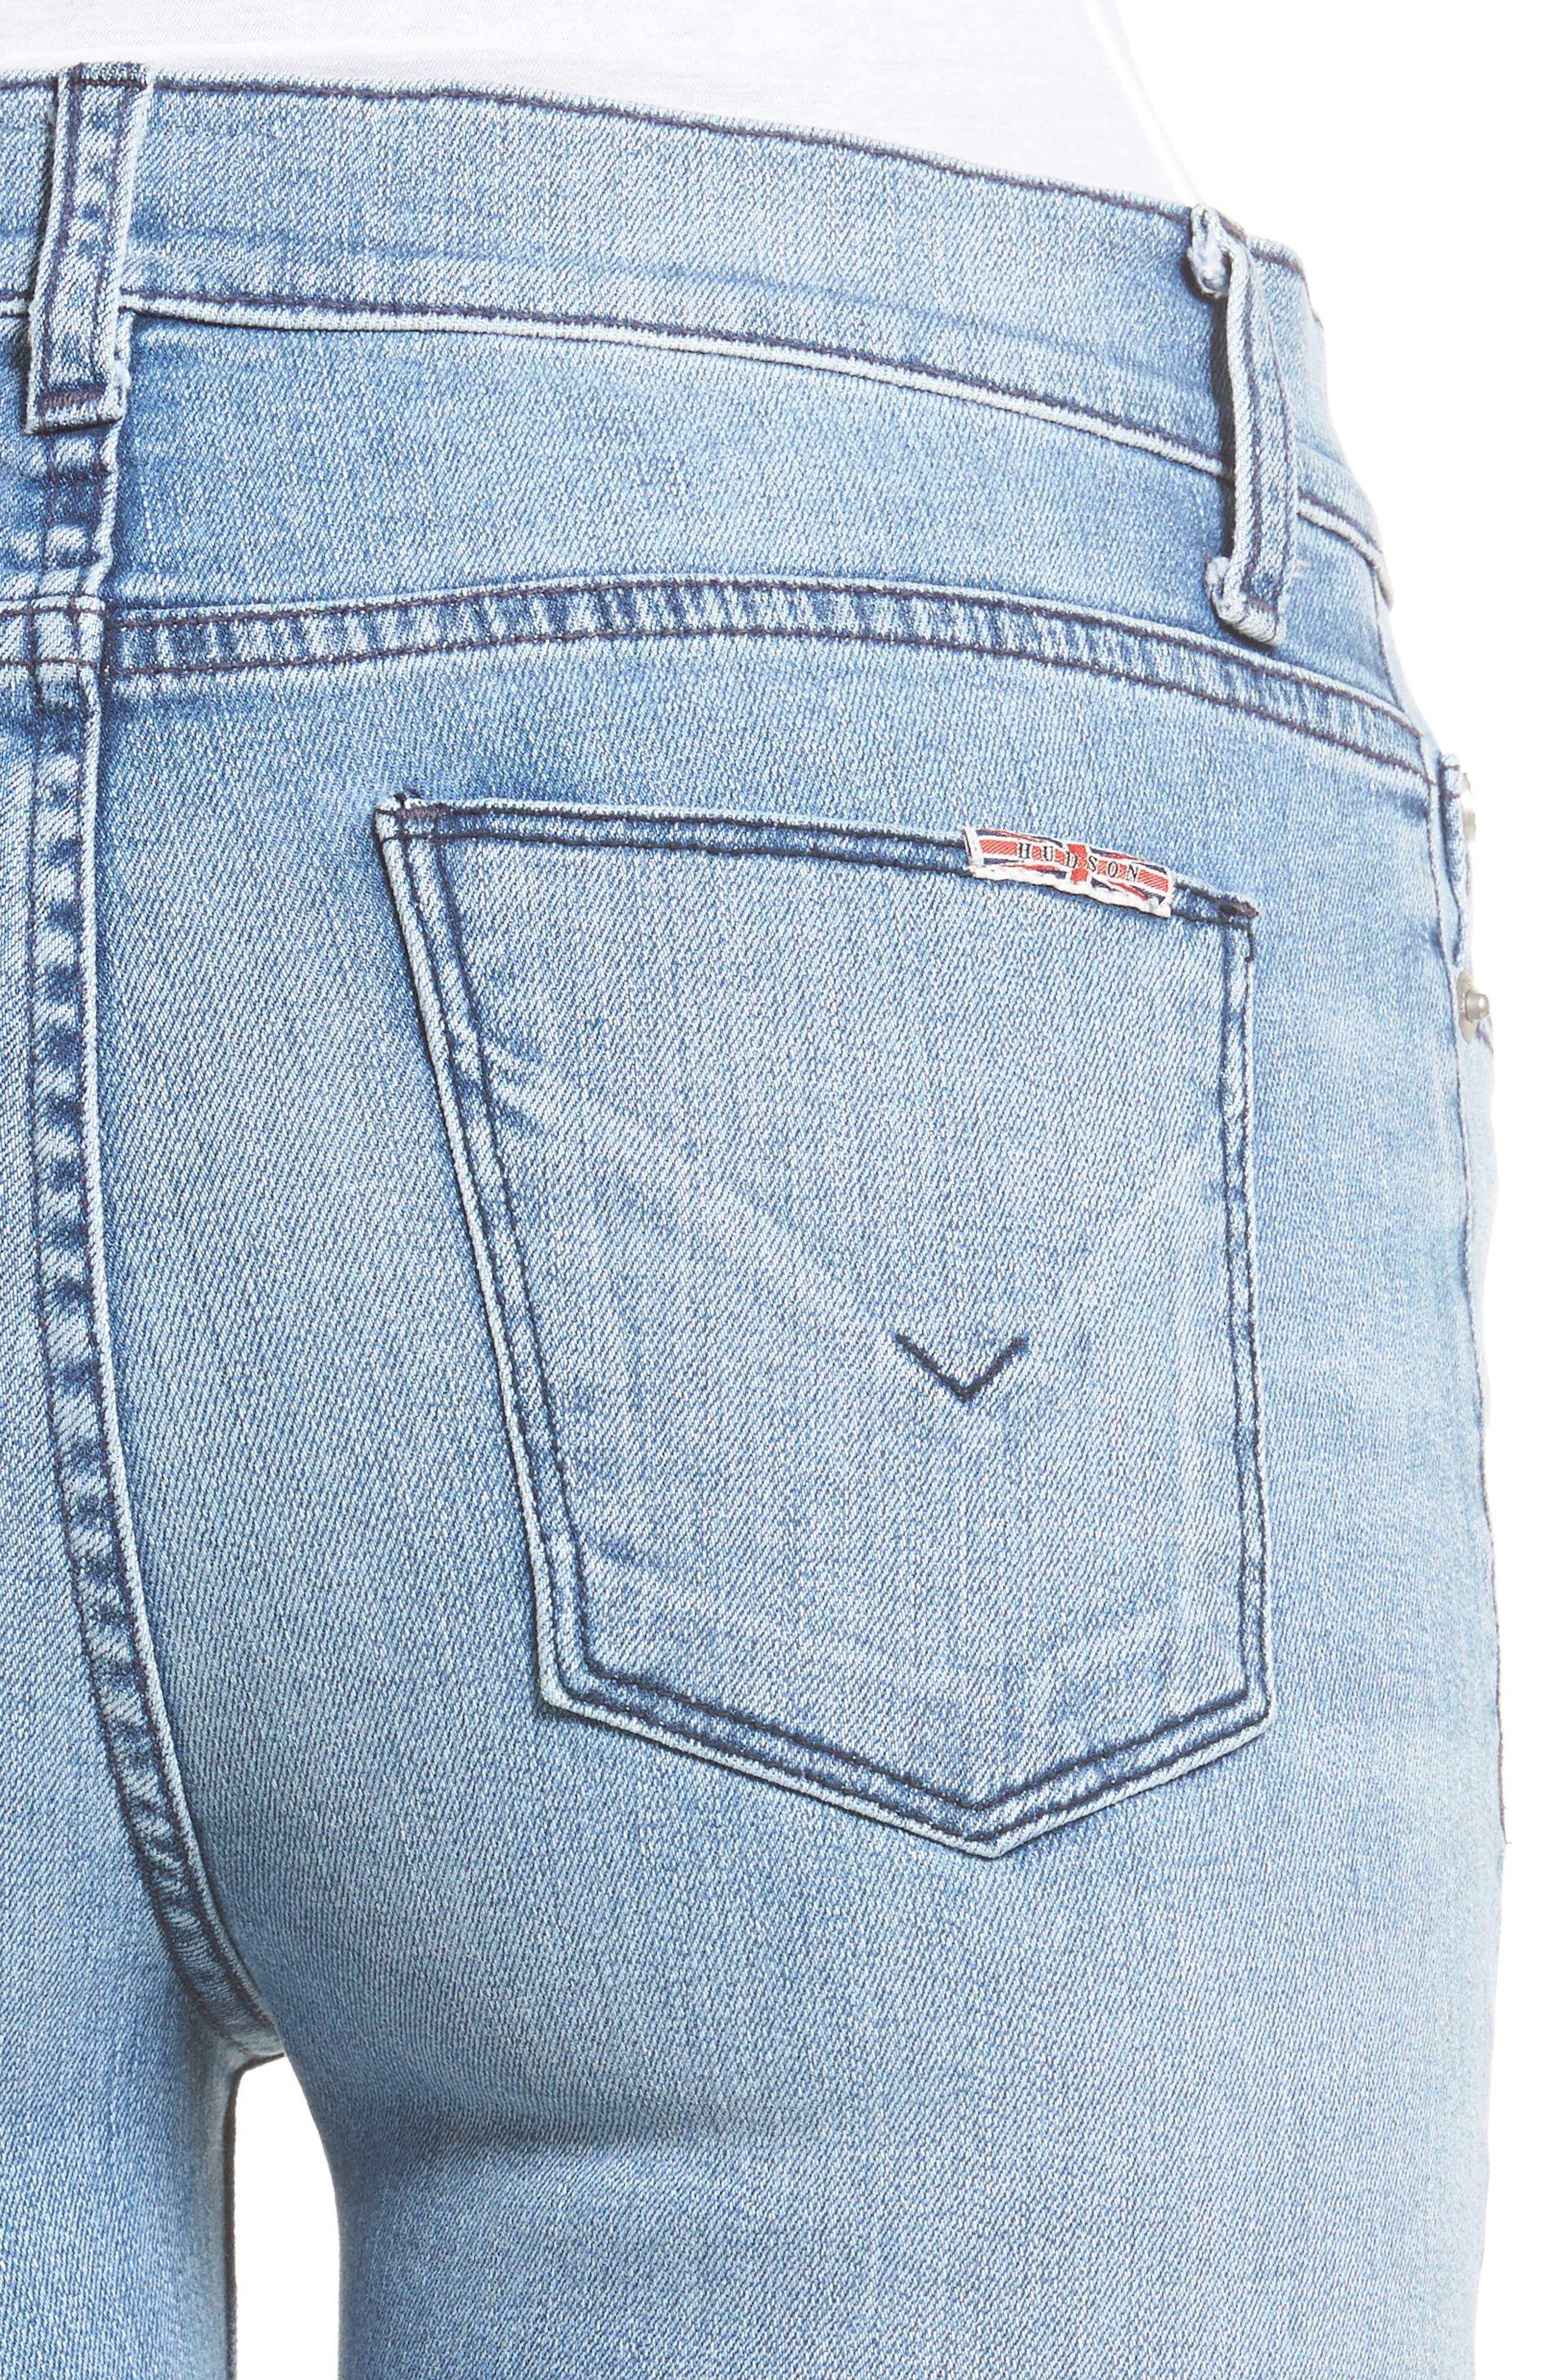 Ciara High Waist Skinny Jeans,                             Alternate thumbnail 10, color,